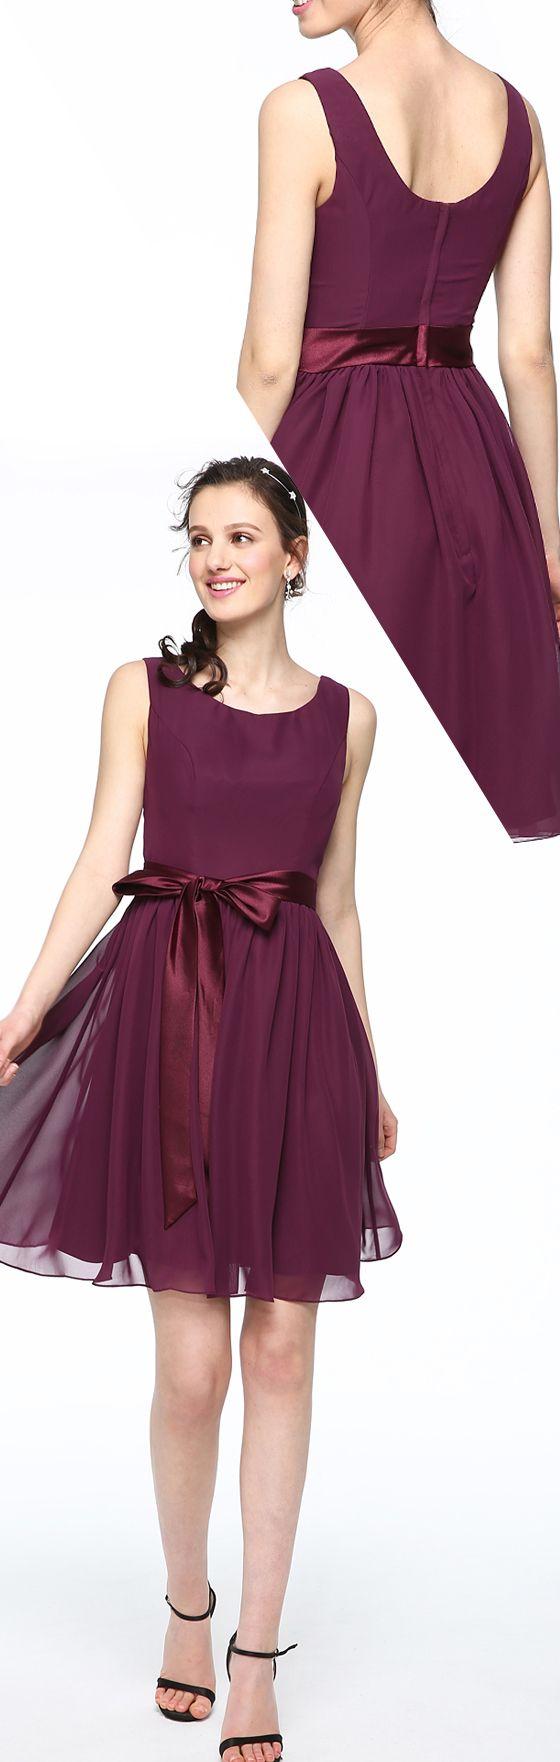 c1559382232 A-Line Scoop Neck Short   Mini Chiffon Satin Bridesmaid Dress with Bow(s)  Sash   Ribbon Pleats by LAN TING BRIDE®